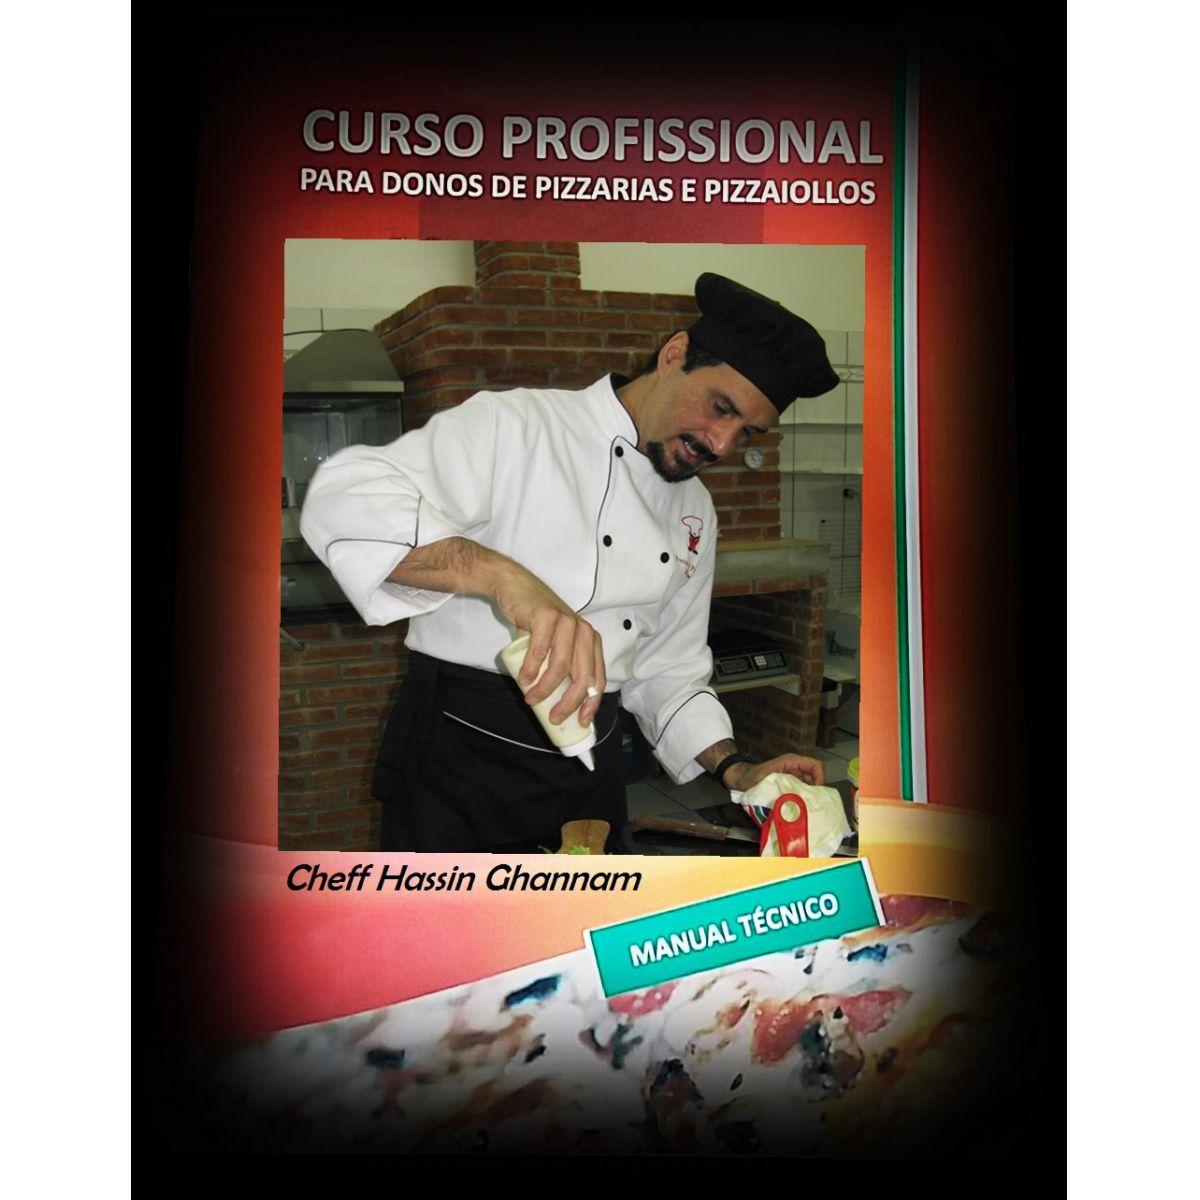 TRILOGIA DOS DVDs  VOLUMES I, II,III POR SEDEX  - Fórum de Pizzas Vendas online